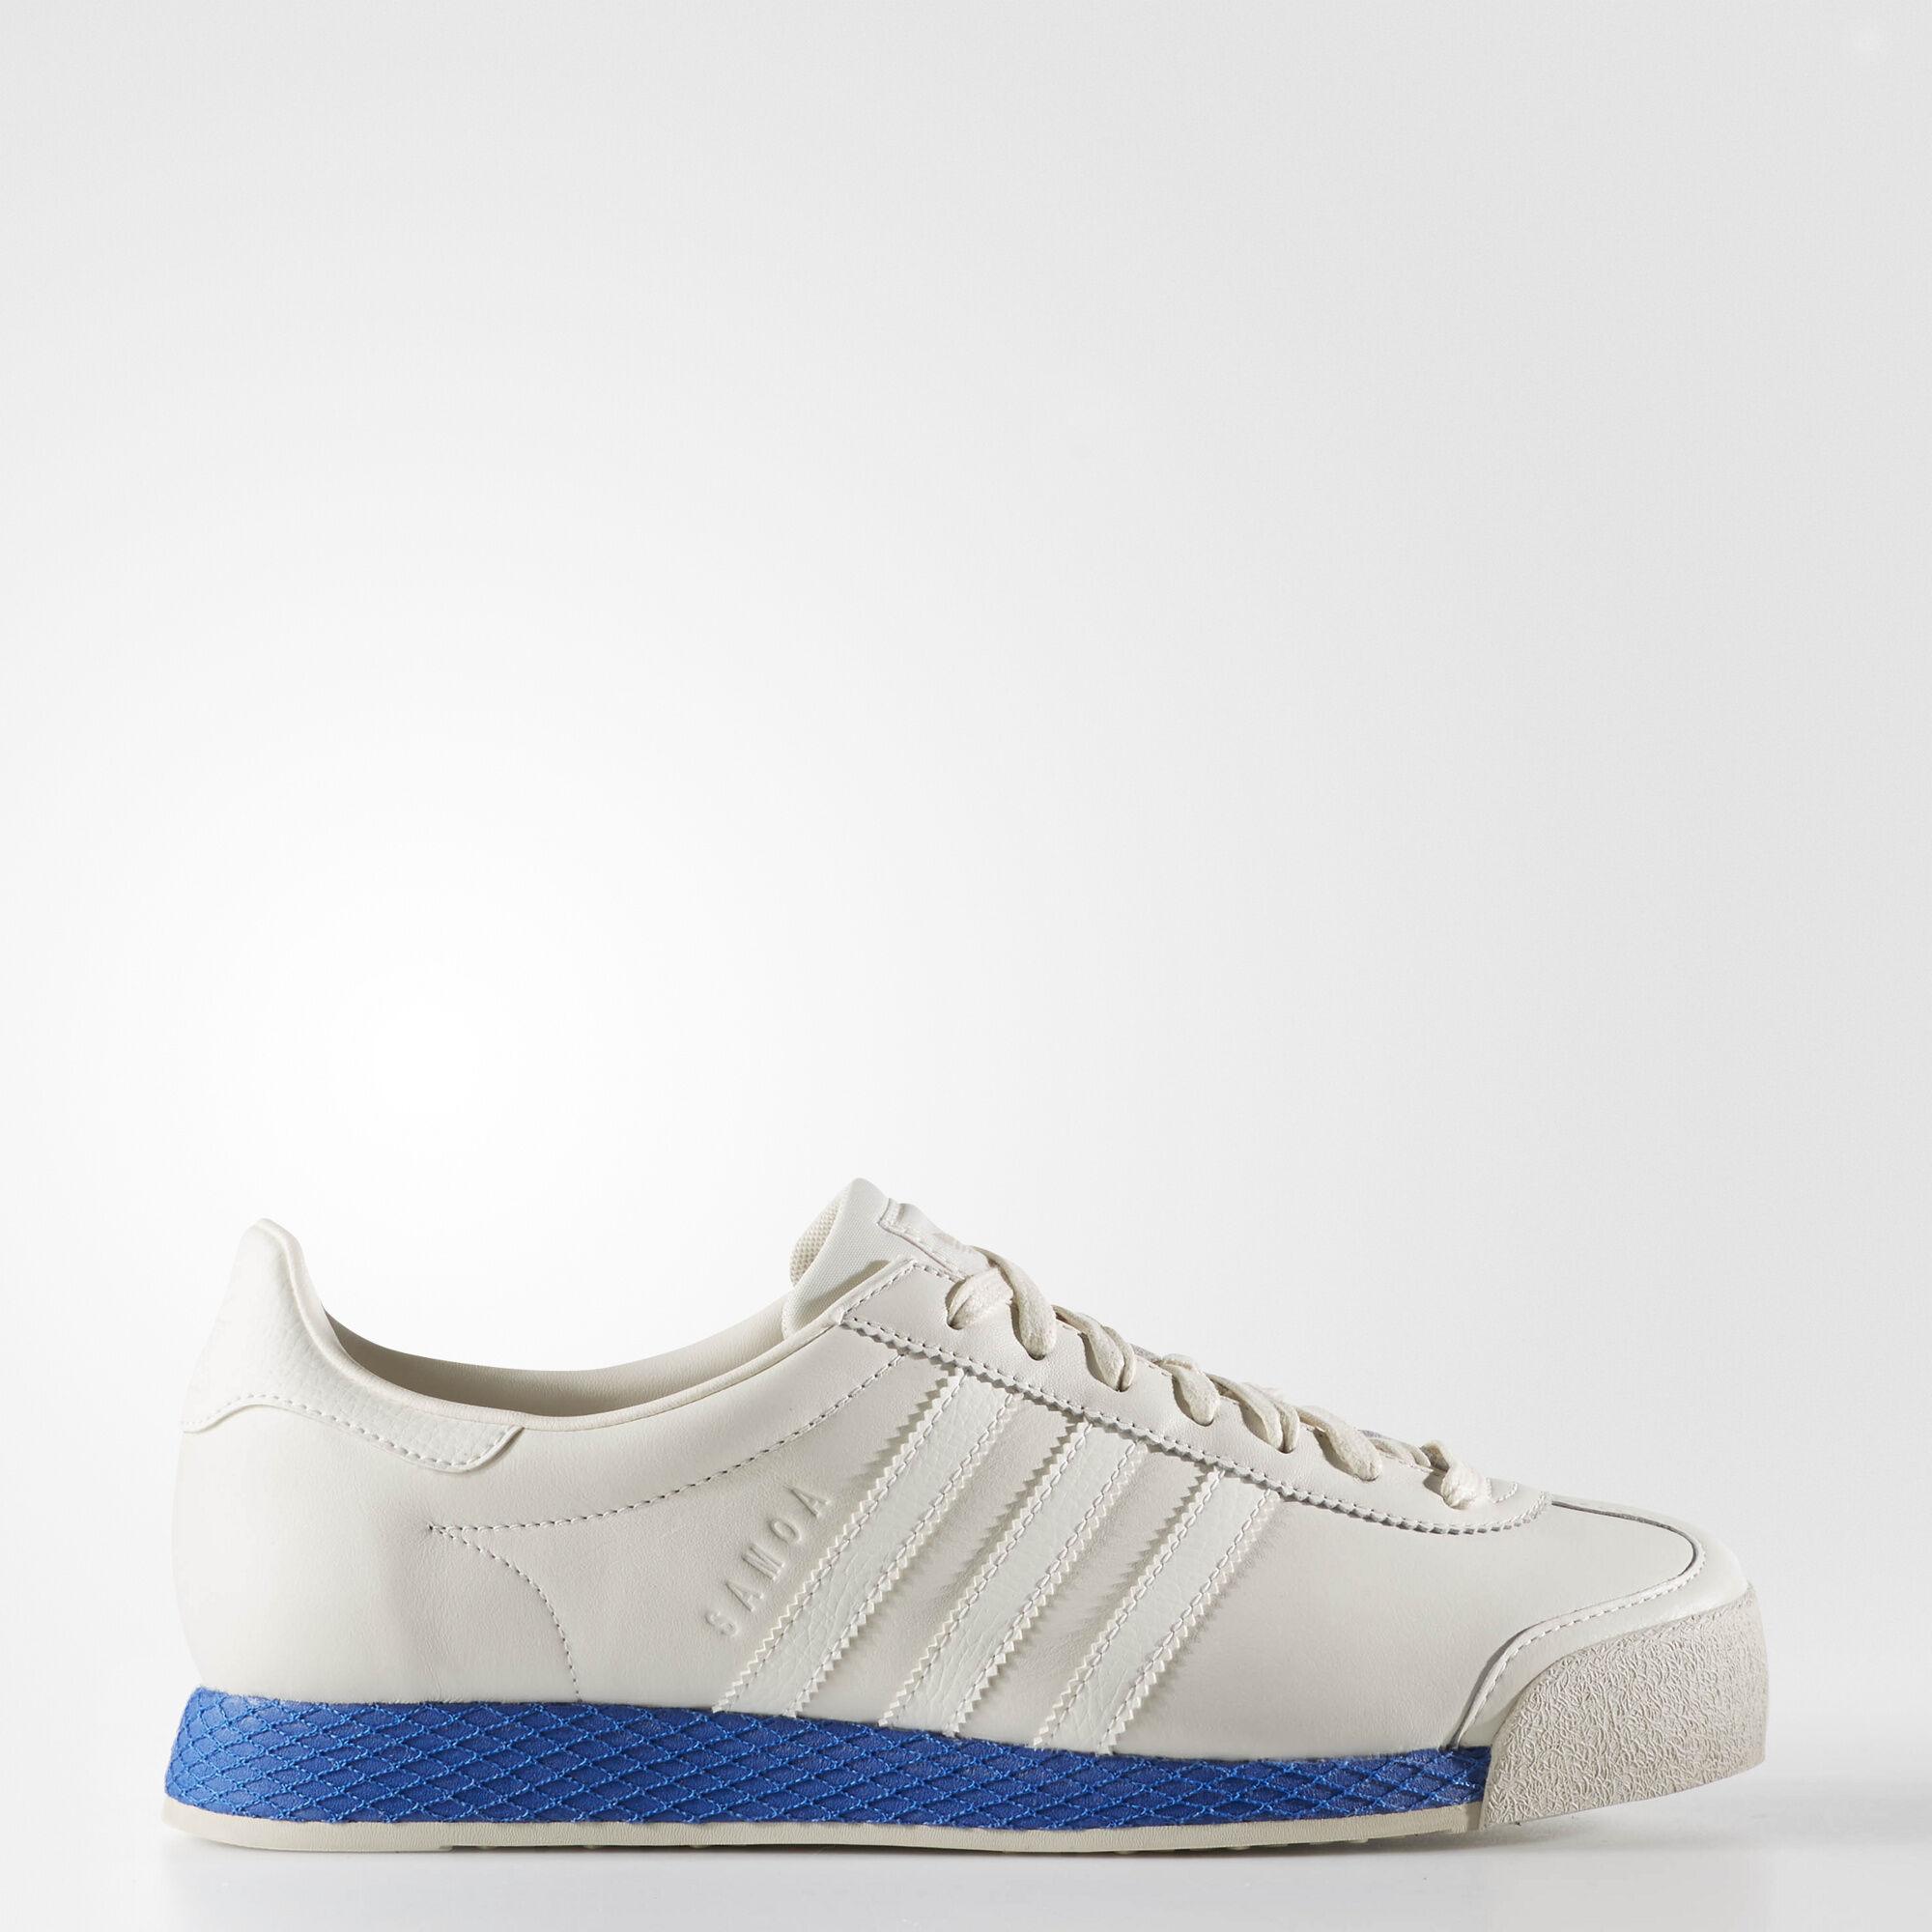 samoa adidas white